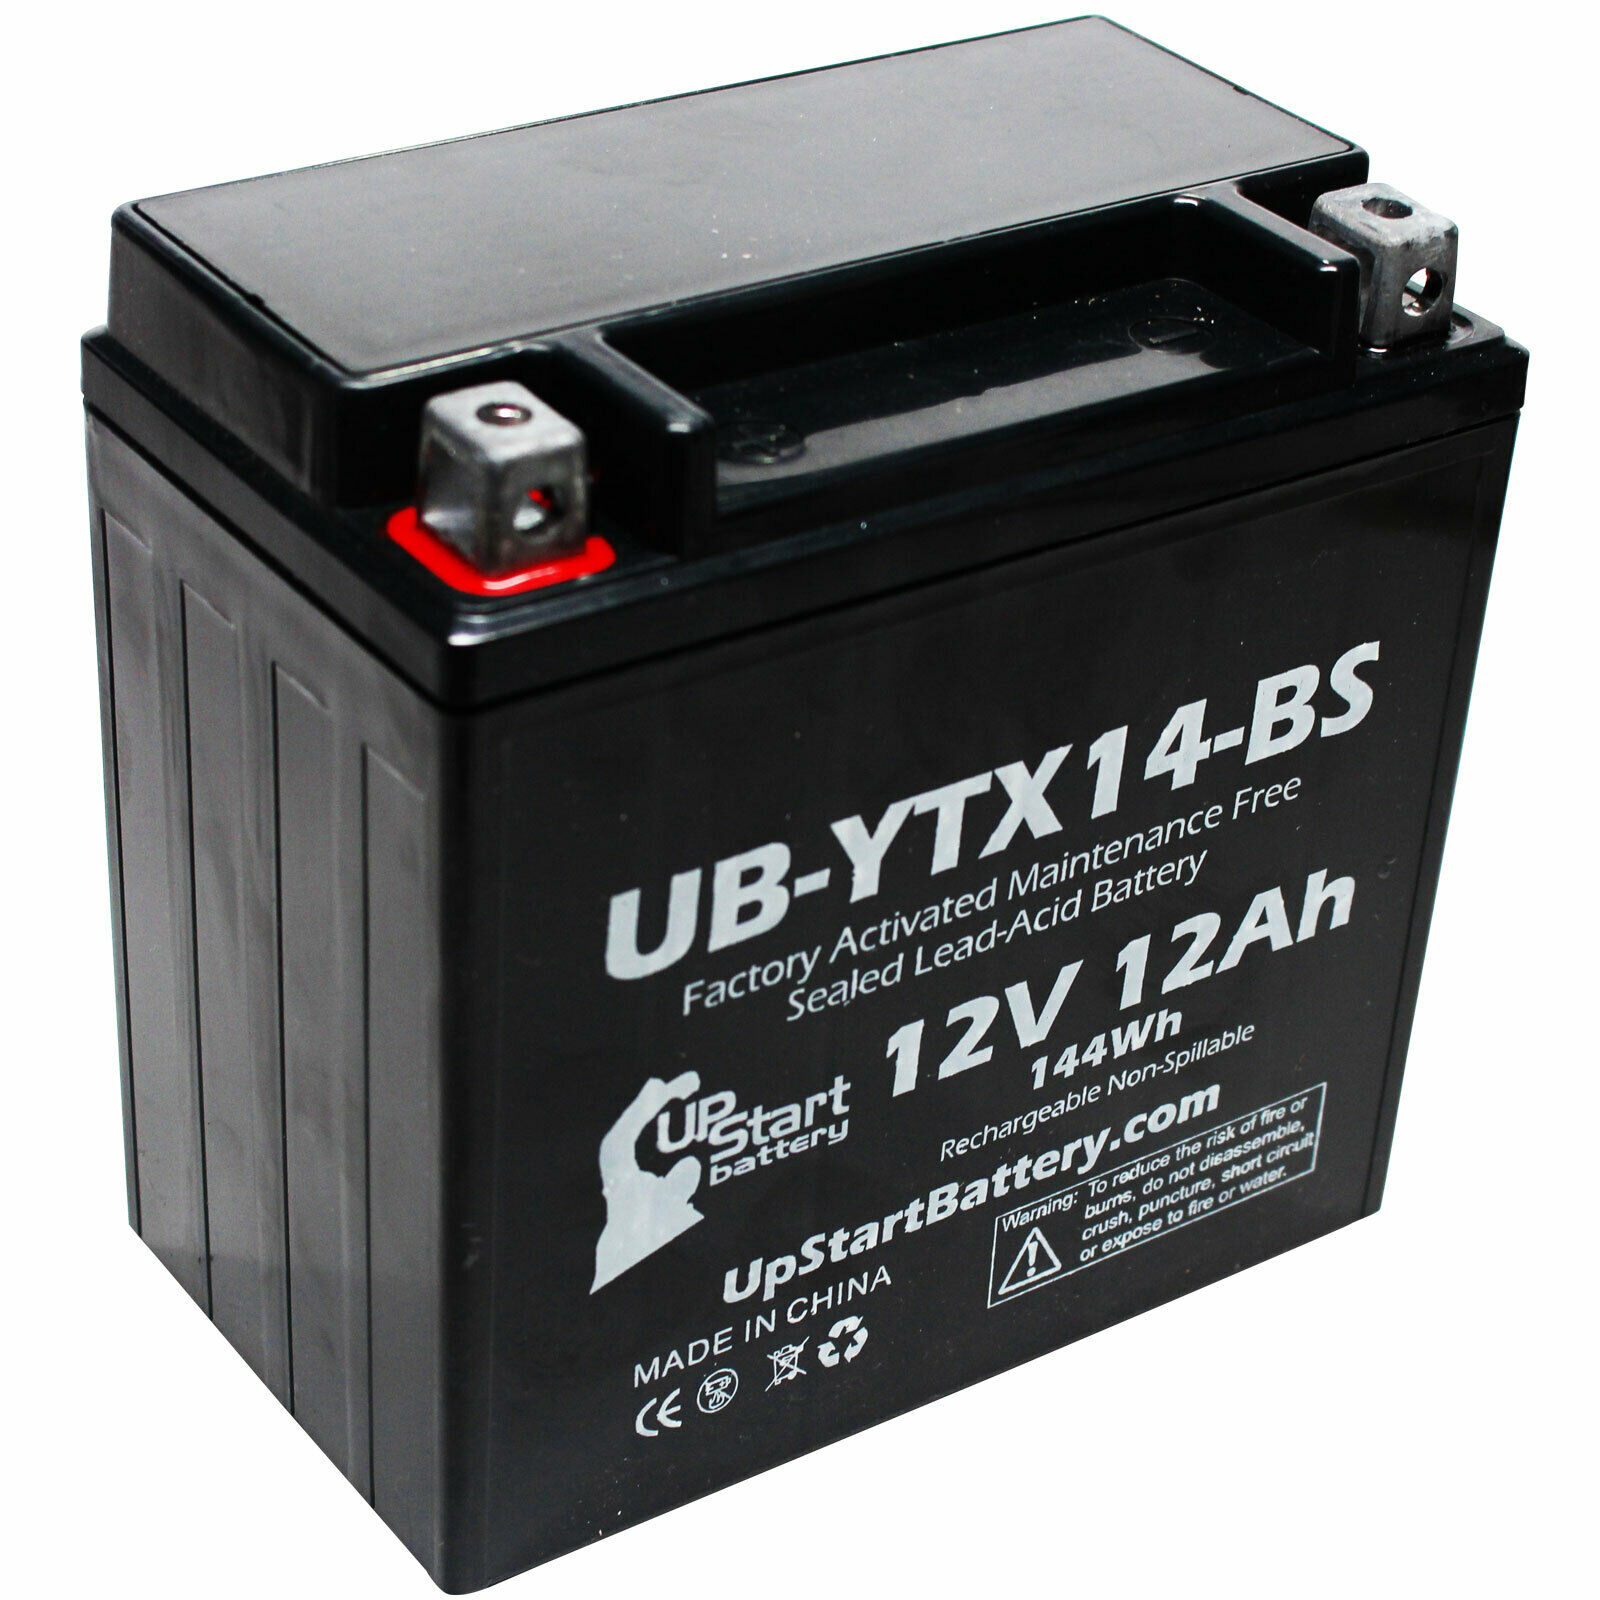 12V 12AH Battery for 2003 Honda TRX650 FourTrax Rincon